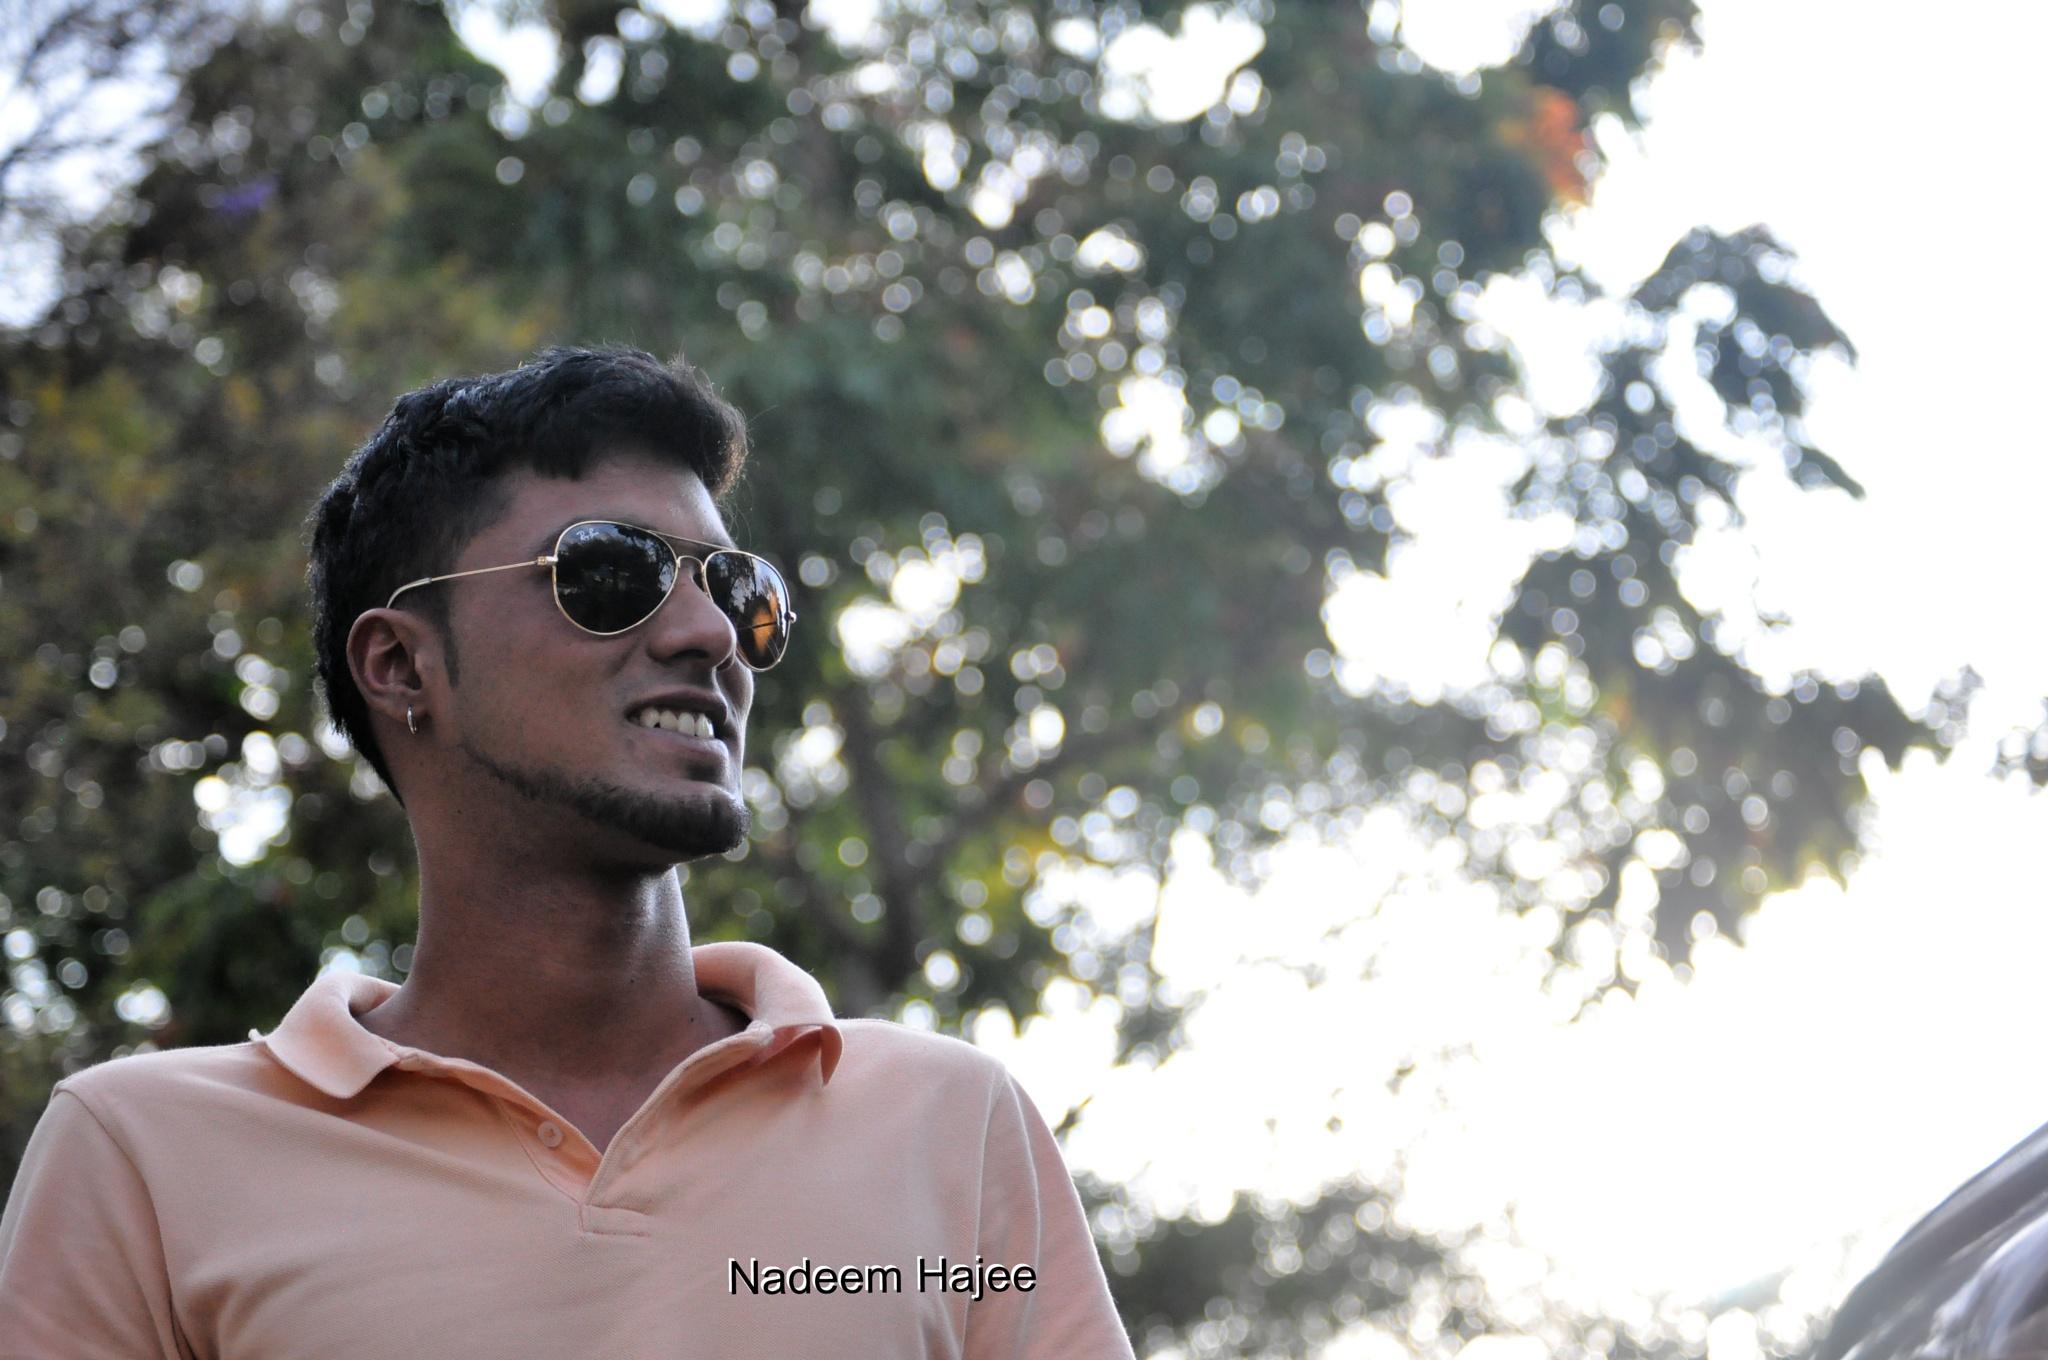 Enjoying The Moment by Nadeem Hajee